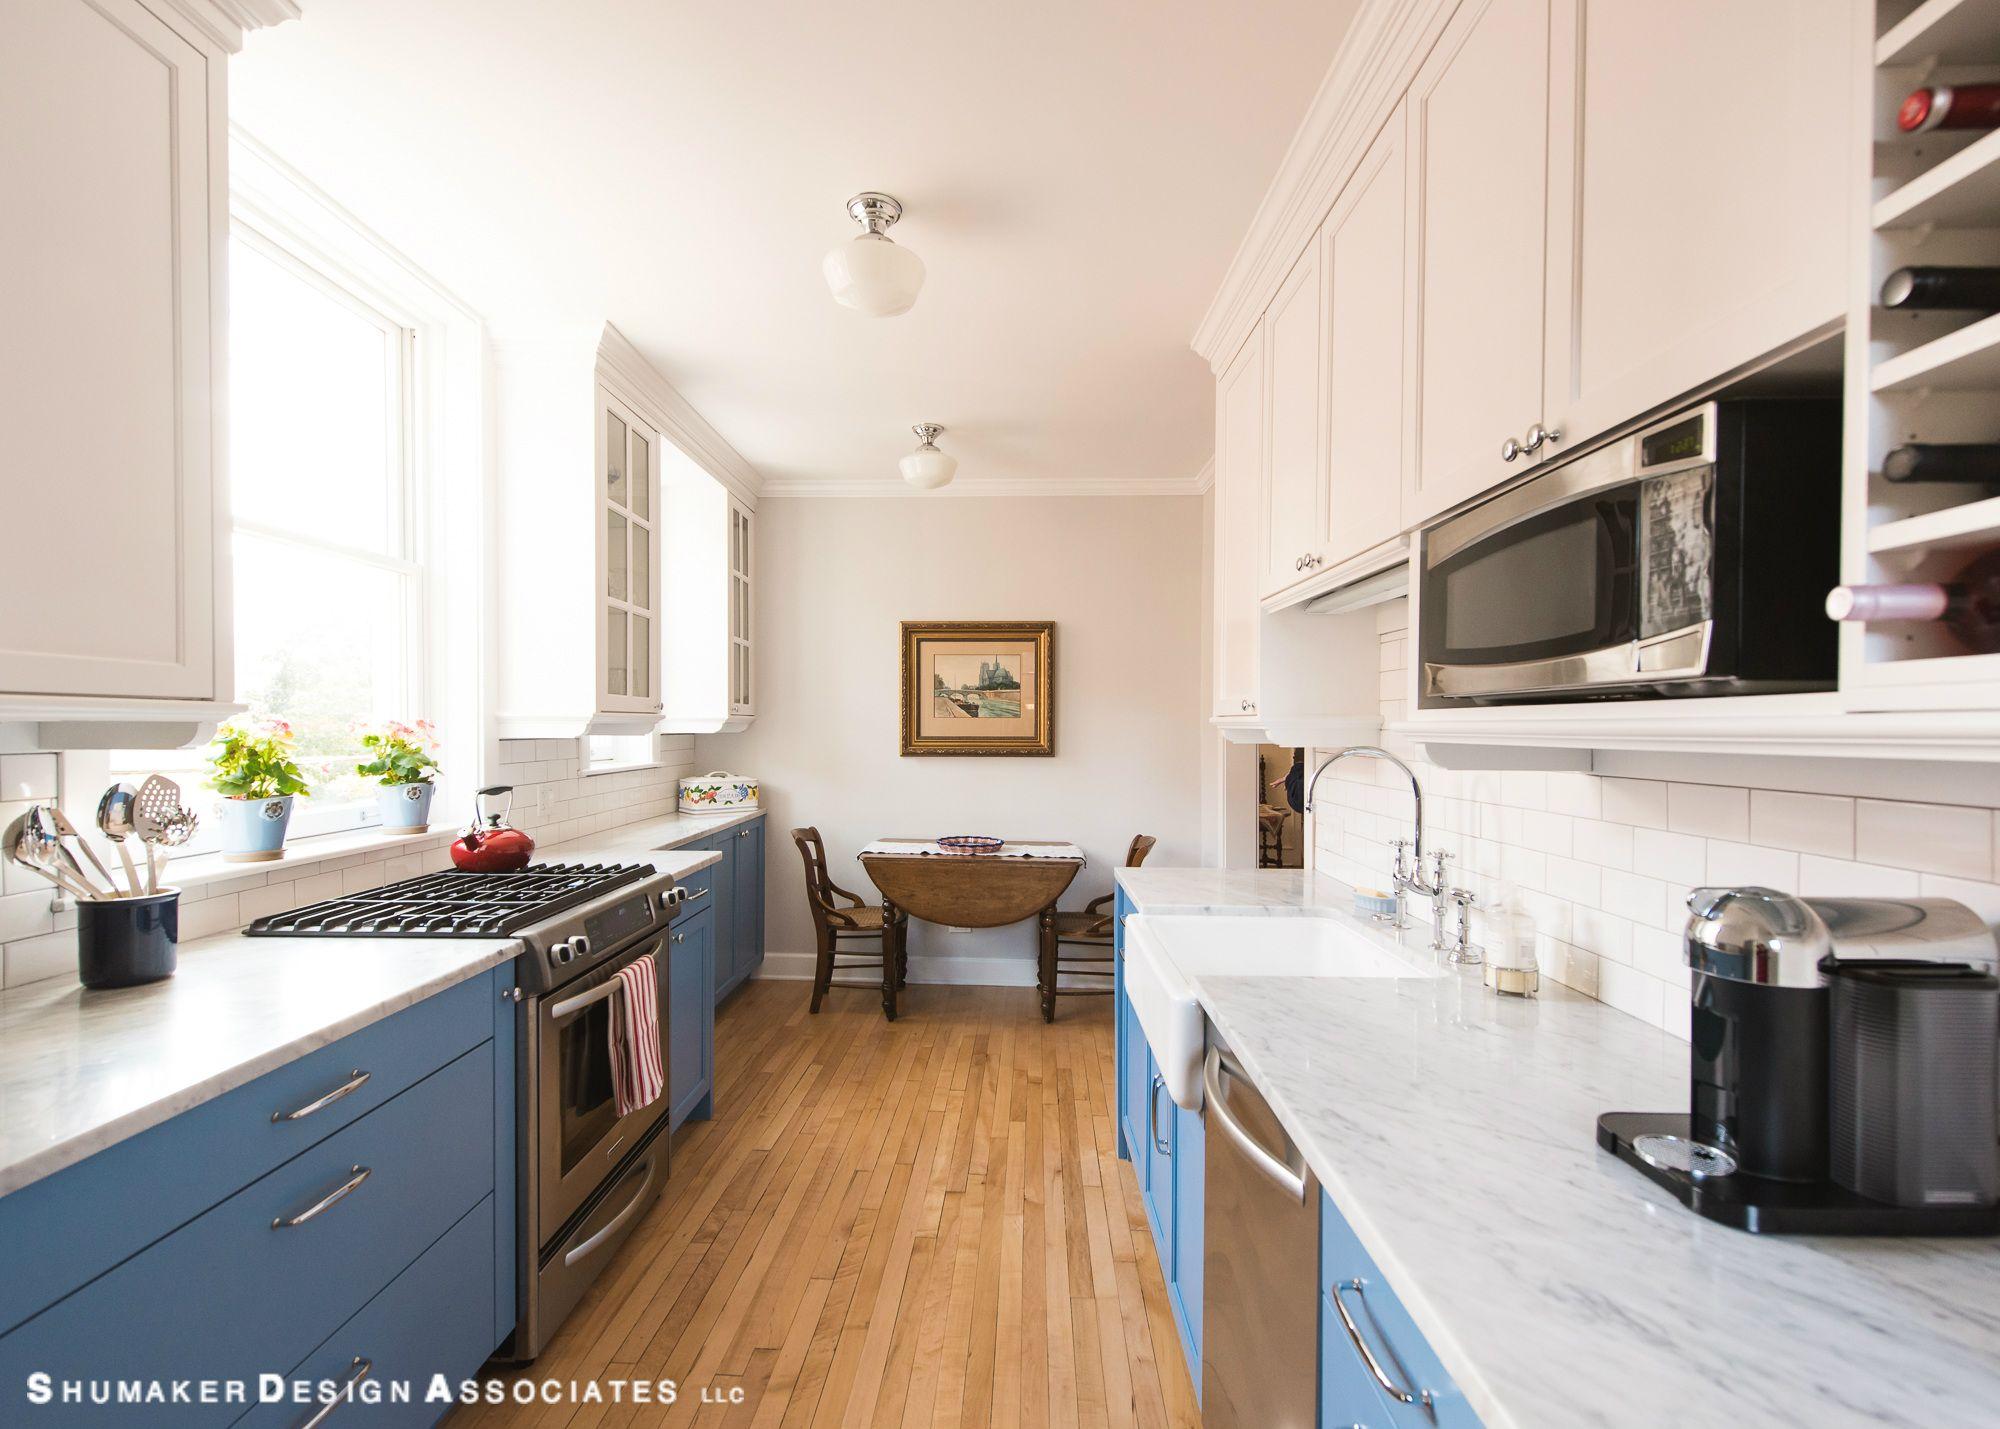 Kitchen Design Evanston cooks blue kitchen #shumakerdesignassociates #evanston #northshore